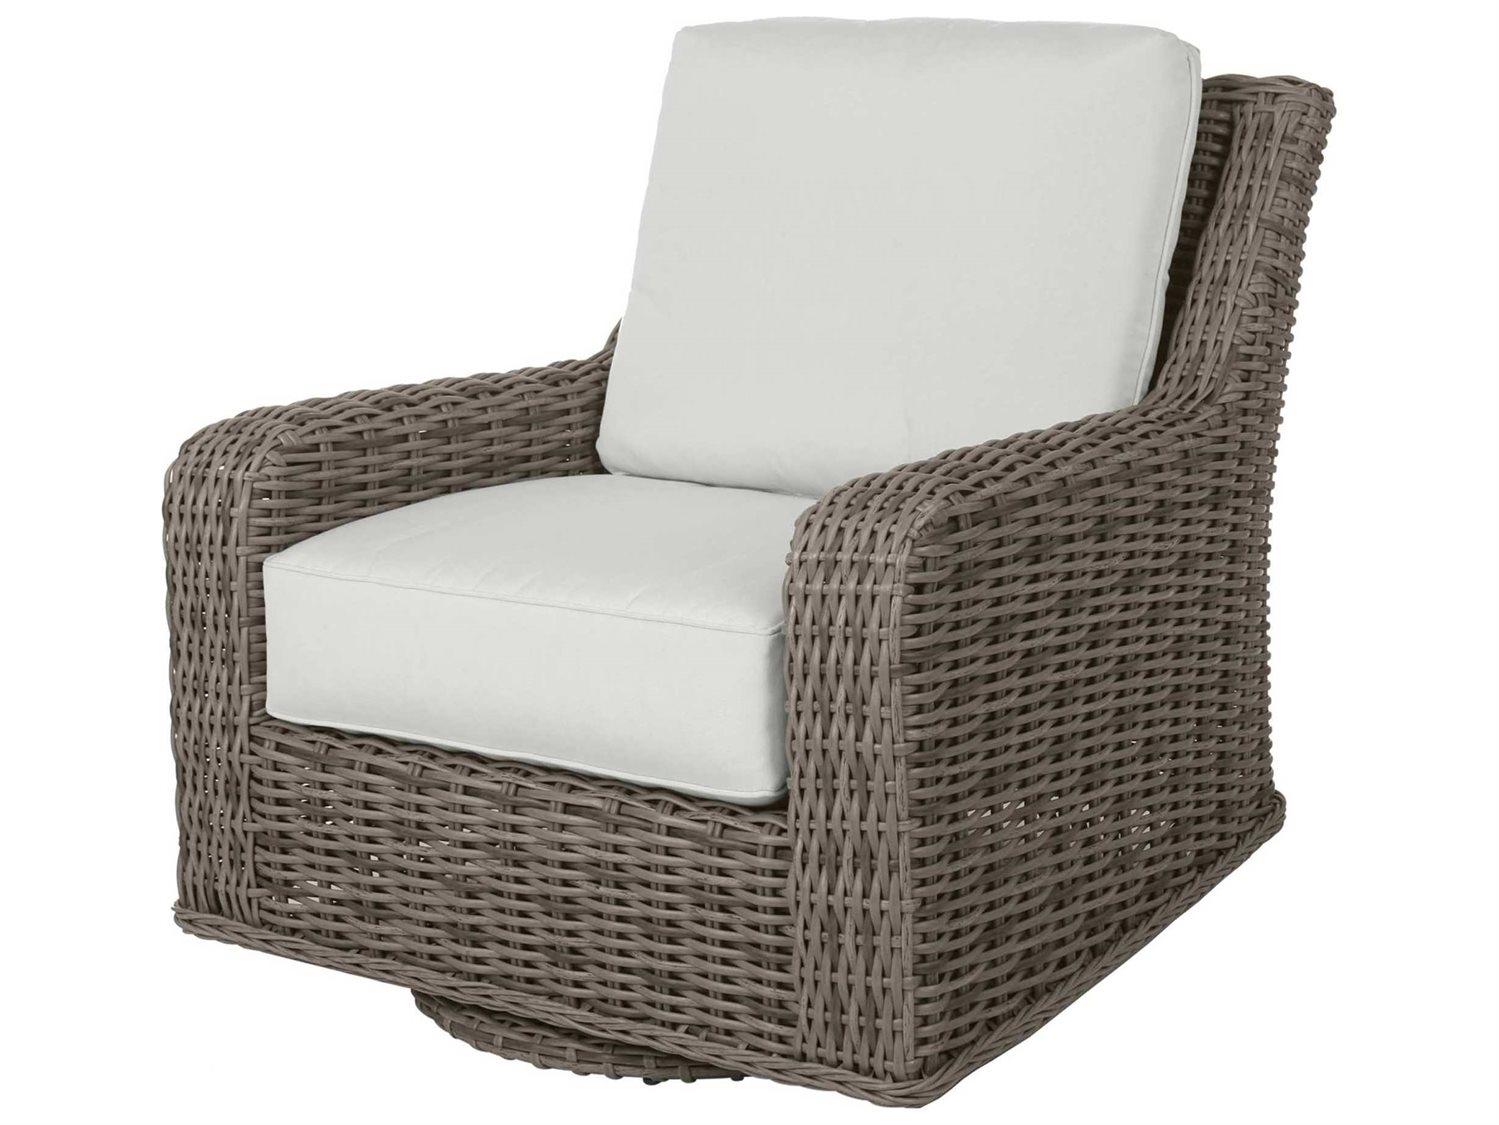 Terrific Ebel Laurent Wicker Swivel Glider Lounge Chair Beatyapartments Chair Design Images Beatyapartmentscom